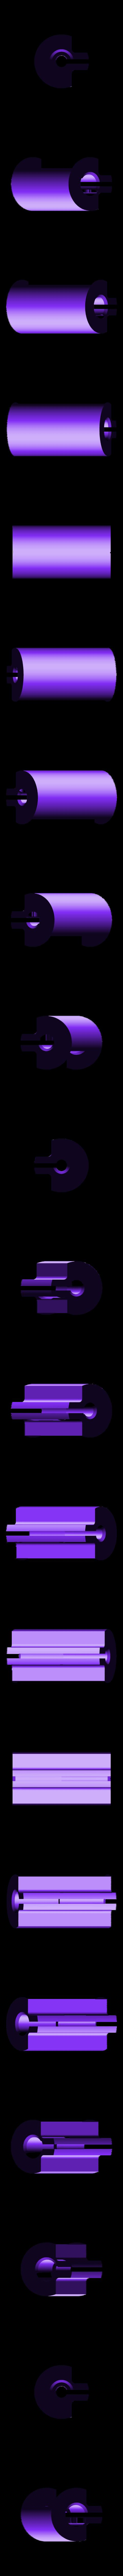 M8_to_M5_connector.stl Download free STL file Portable 3D Printer • 3D printable design, Job